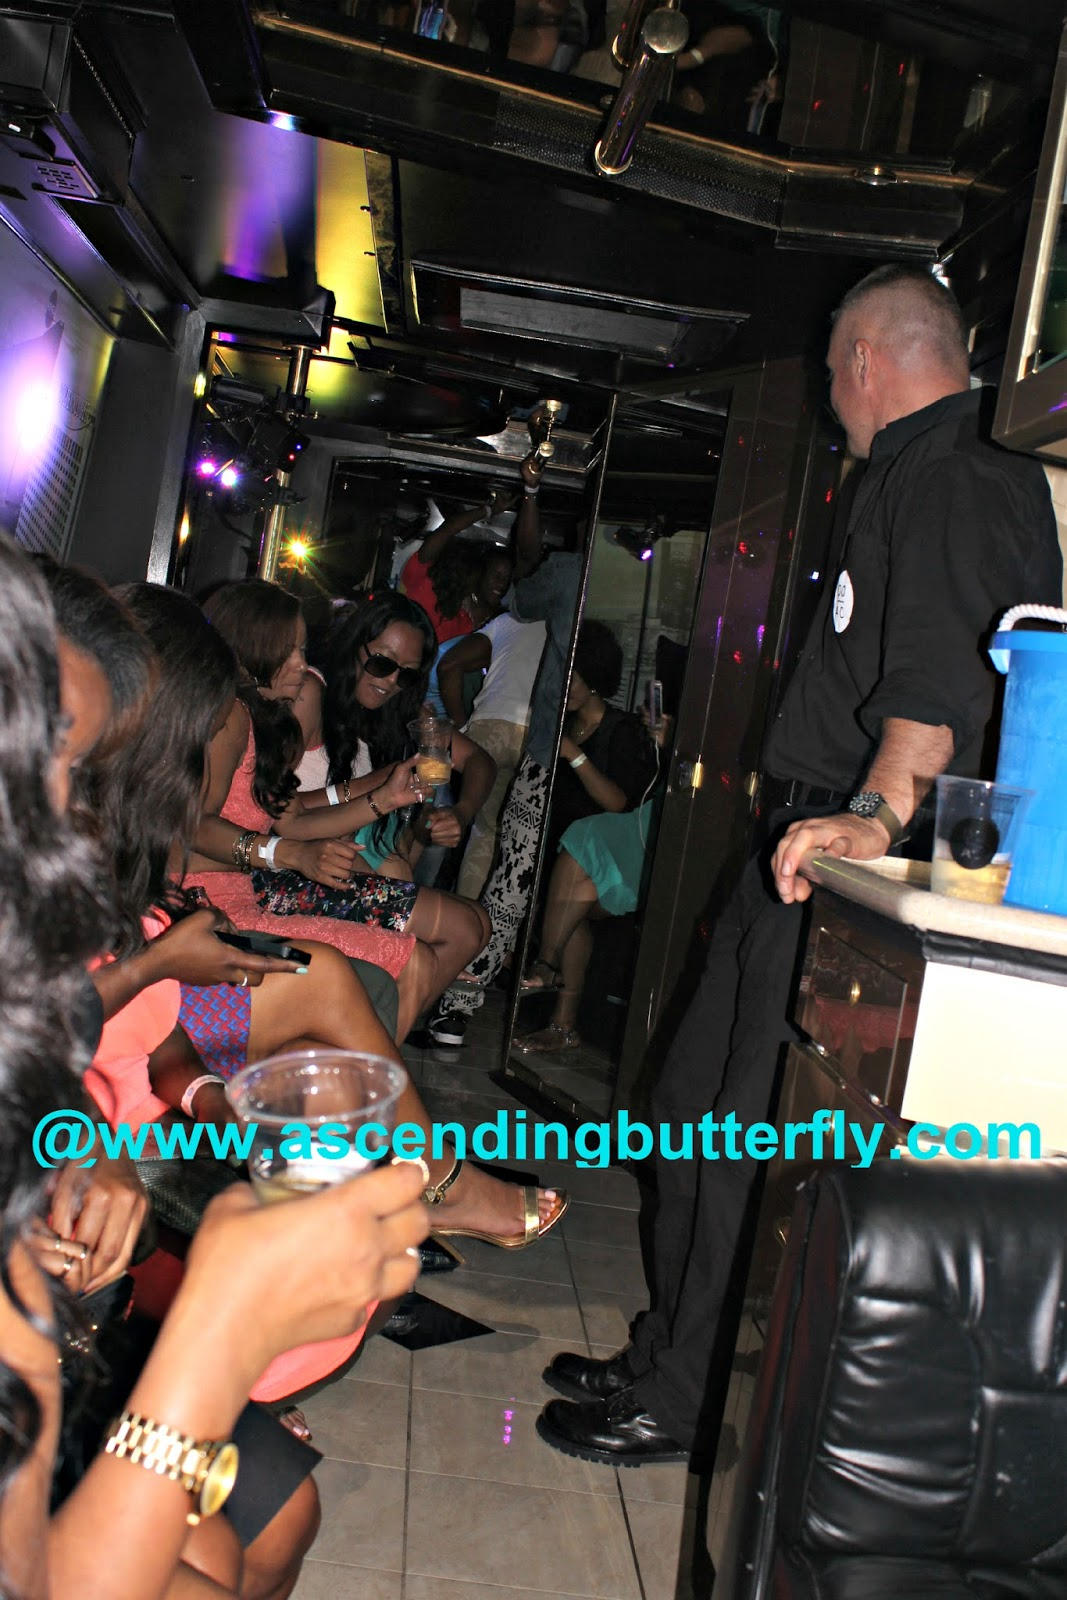 Steve, #DOACNightlife Bus, Party Bus, Atlantic City, Visit AC, Atlantic City Alliance, DO AC, DO AC Nightlife